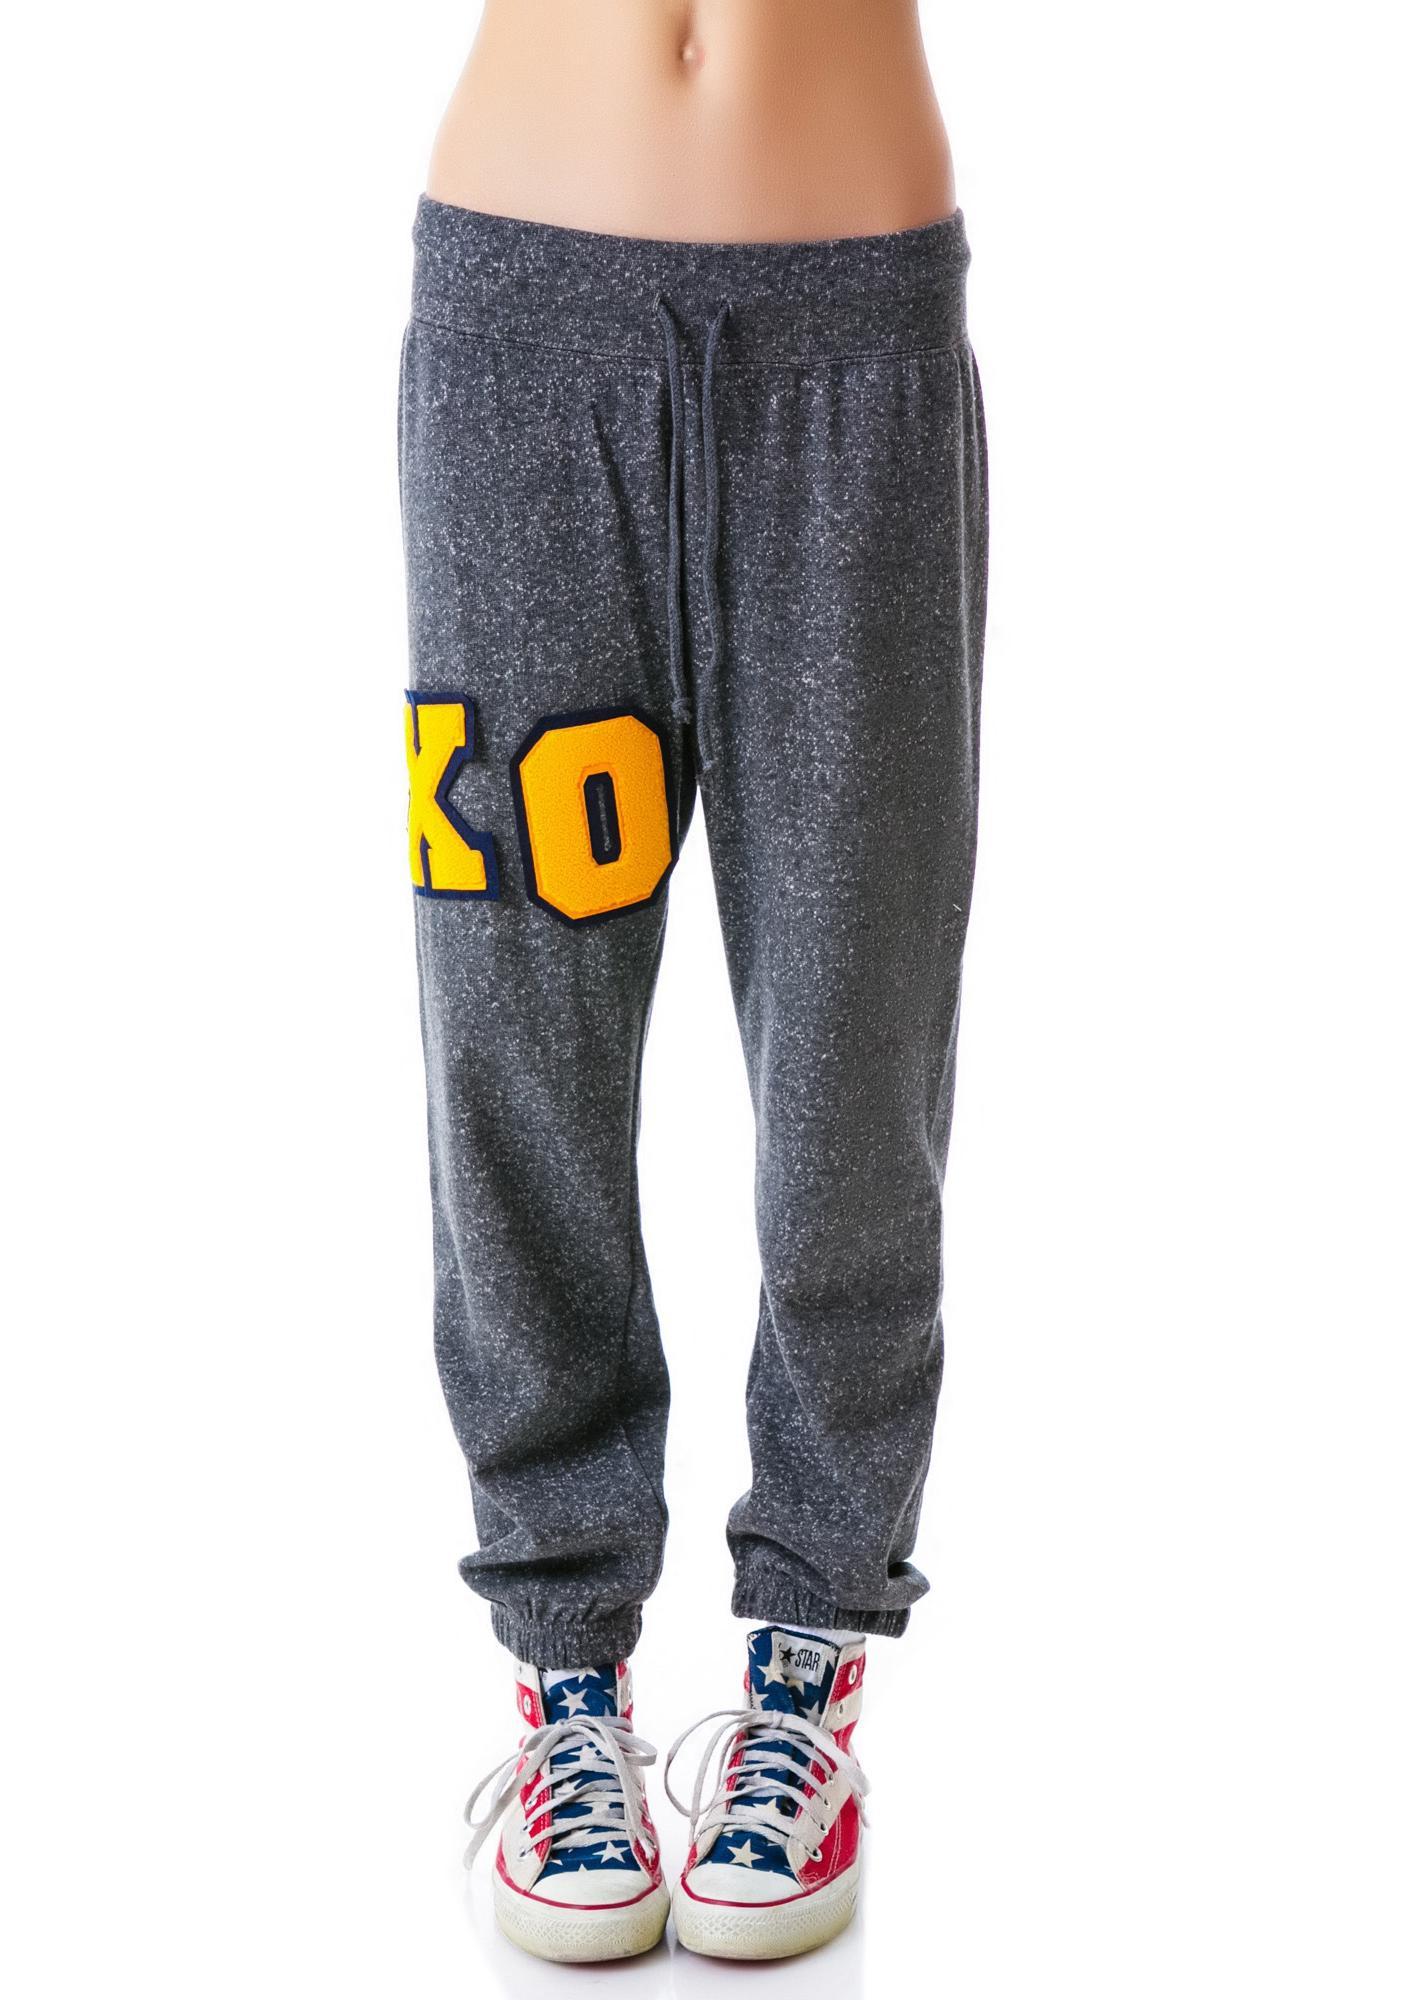 Sauce XO Sweatpants